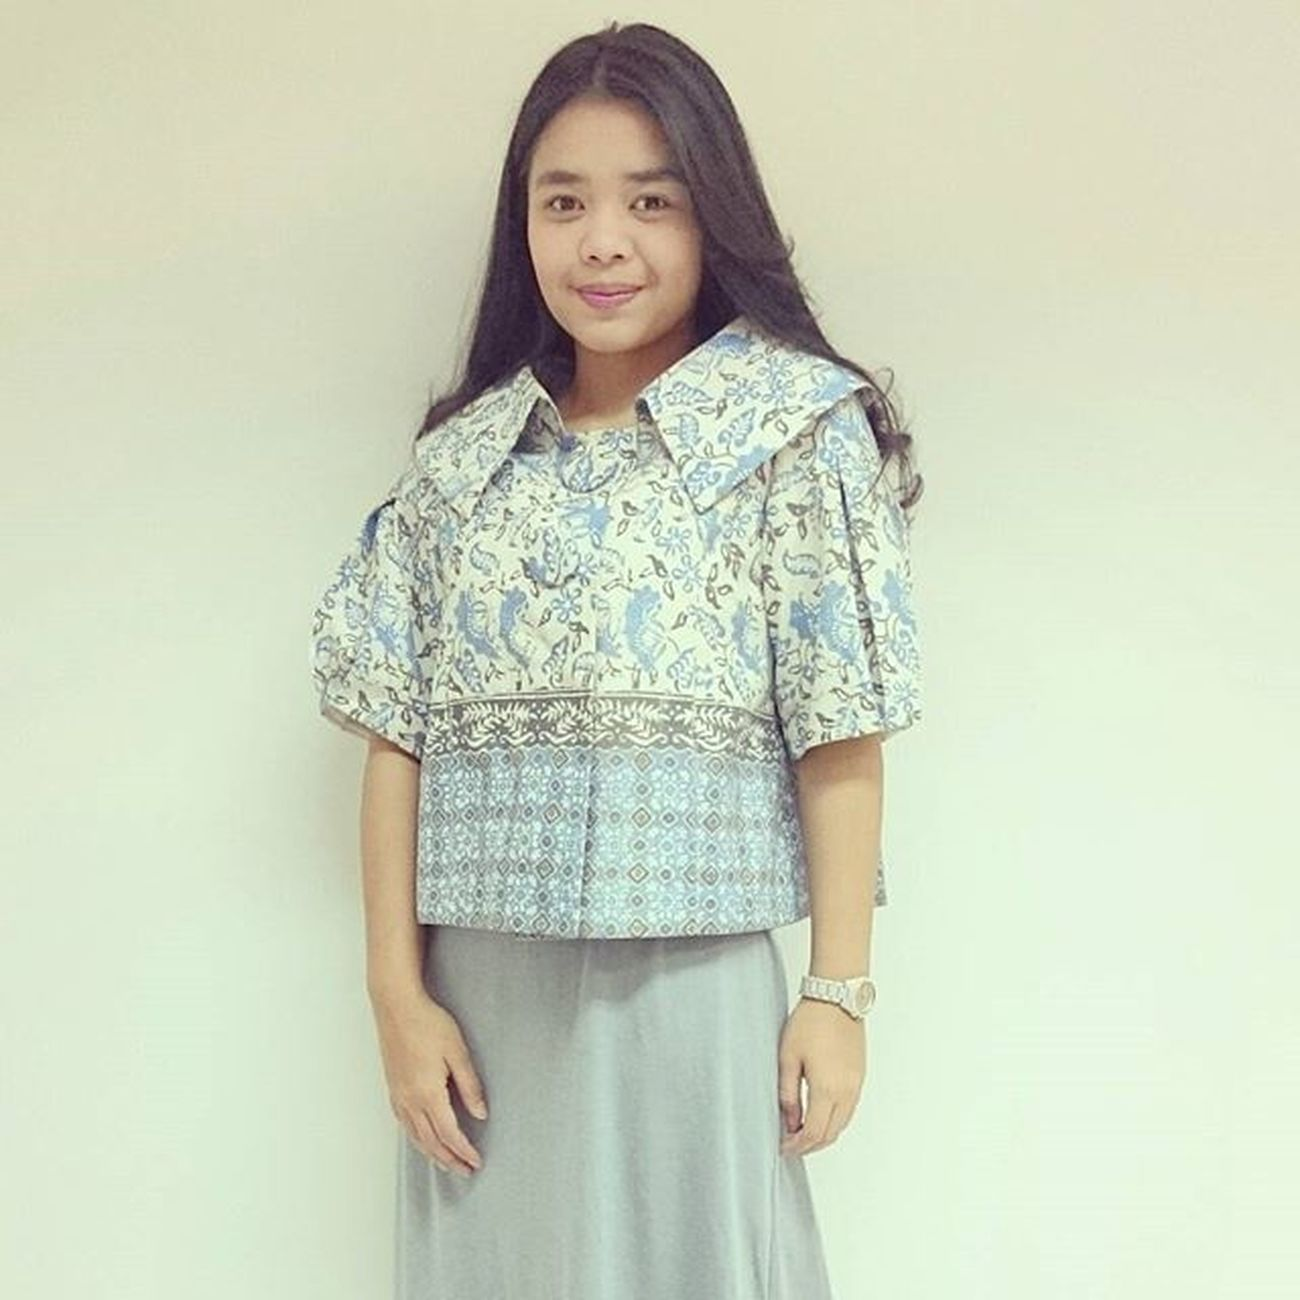 Batik adalah simbol dari keanggunan wanita Indonesia... Mariberbatik BatikIndonesia Batikindigo Melindawijayaindonesia Warm Regards @melindawijayaindonesia